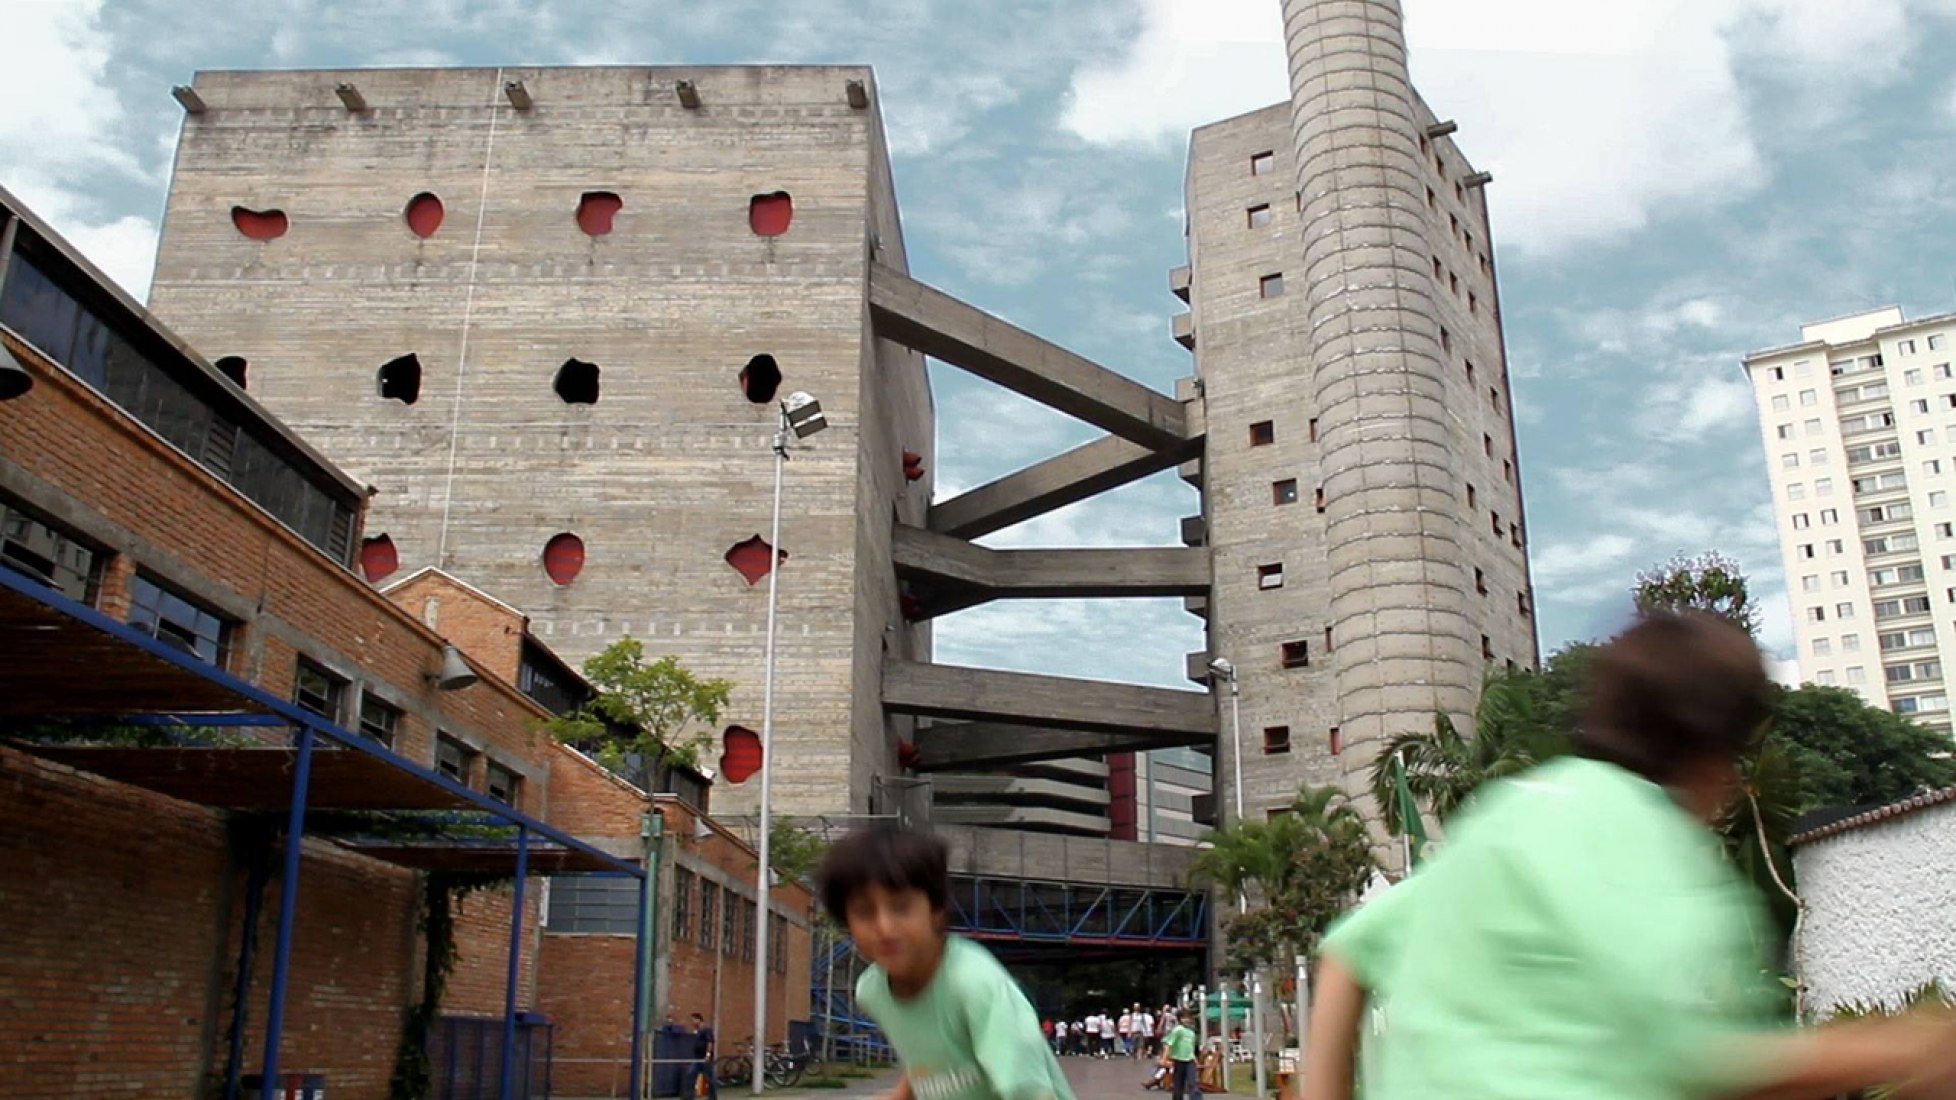 The São Paolo Recreational Center, Lina Bo Bardi. Photography © Tapio Snellman.